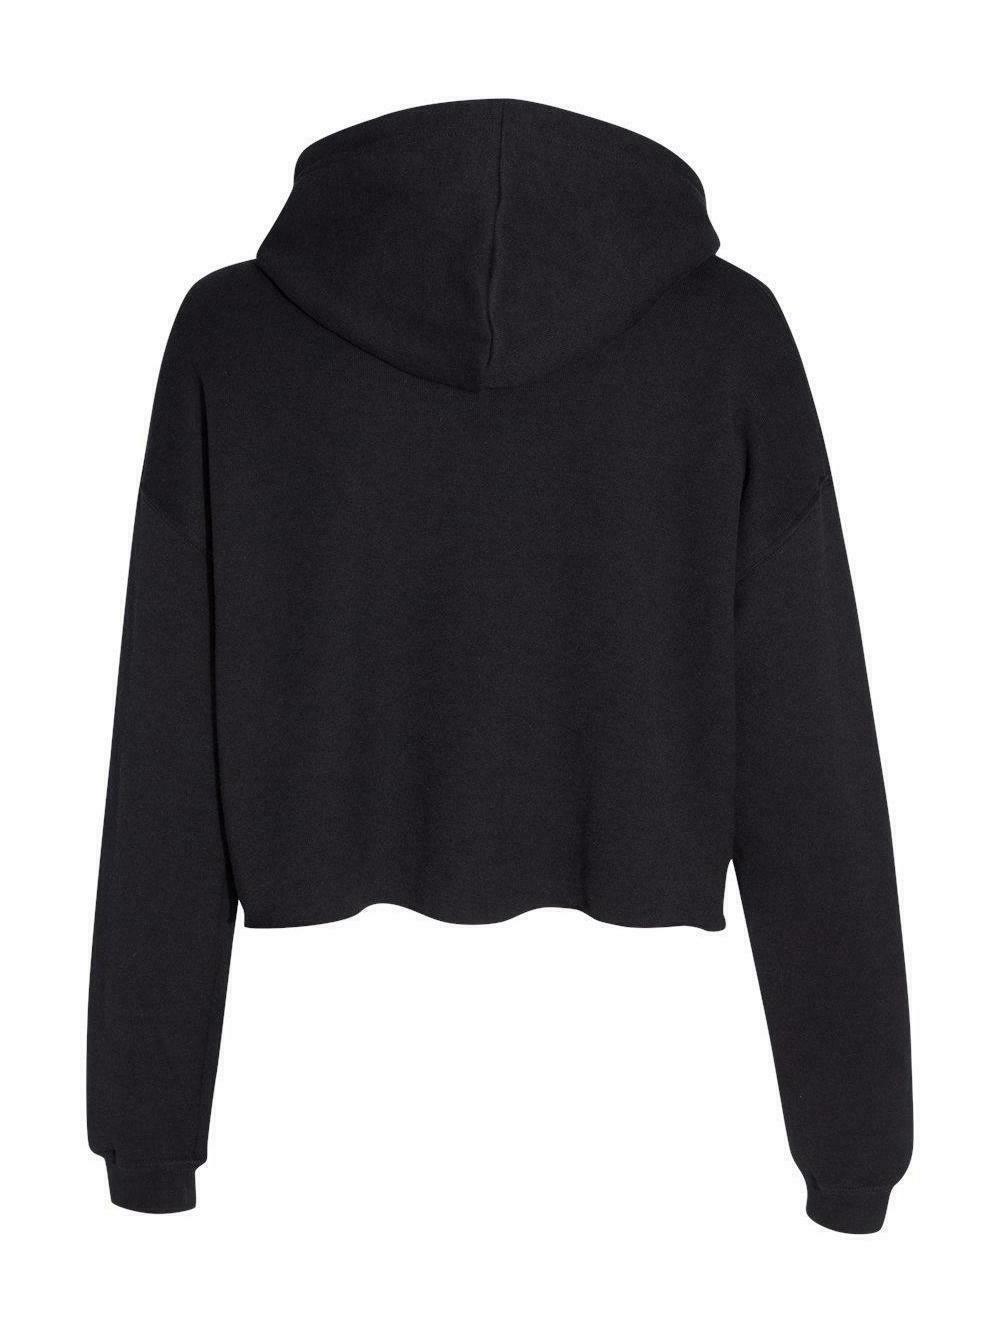 BAD Cropped Fleece Black design apparel INKDEED